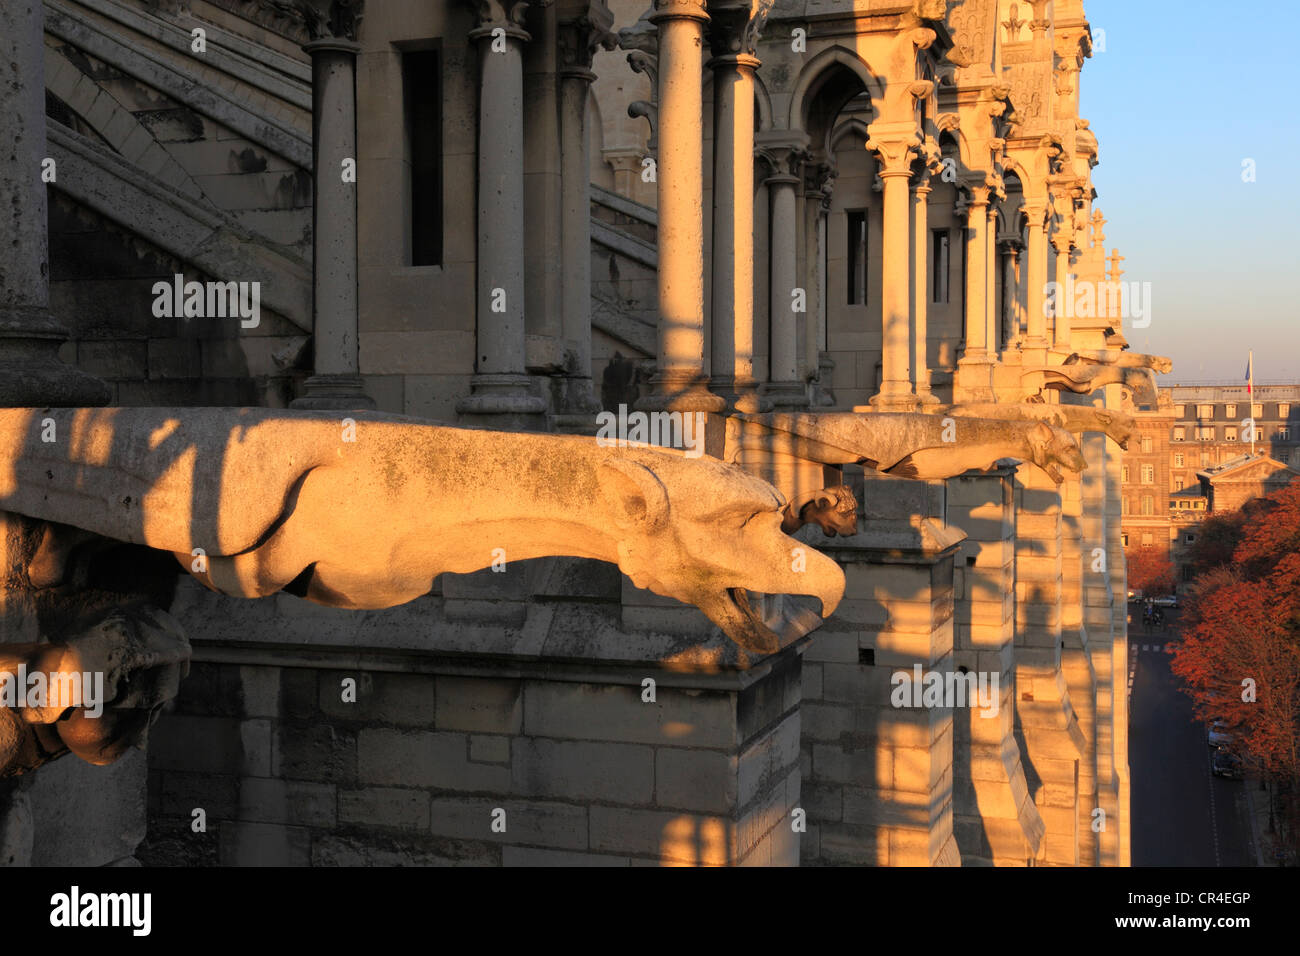 France, Paris, Ile de la Cite, gargoyles on Notre Dame de Paris cathedral cathedral north facade - Stock Image